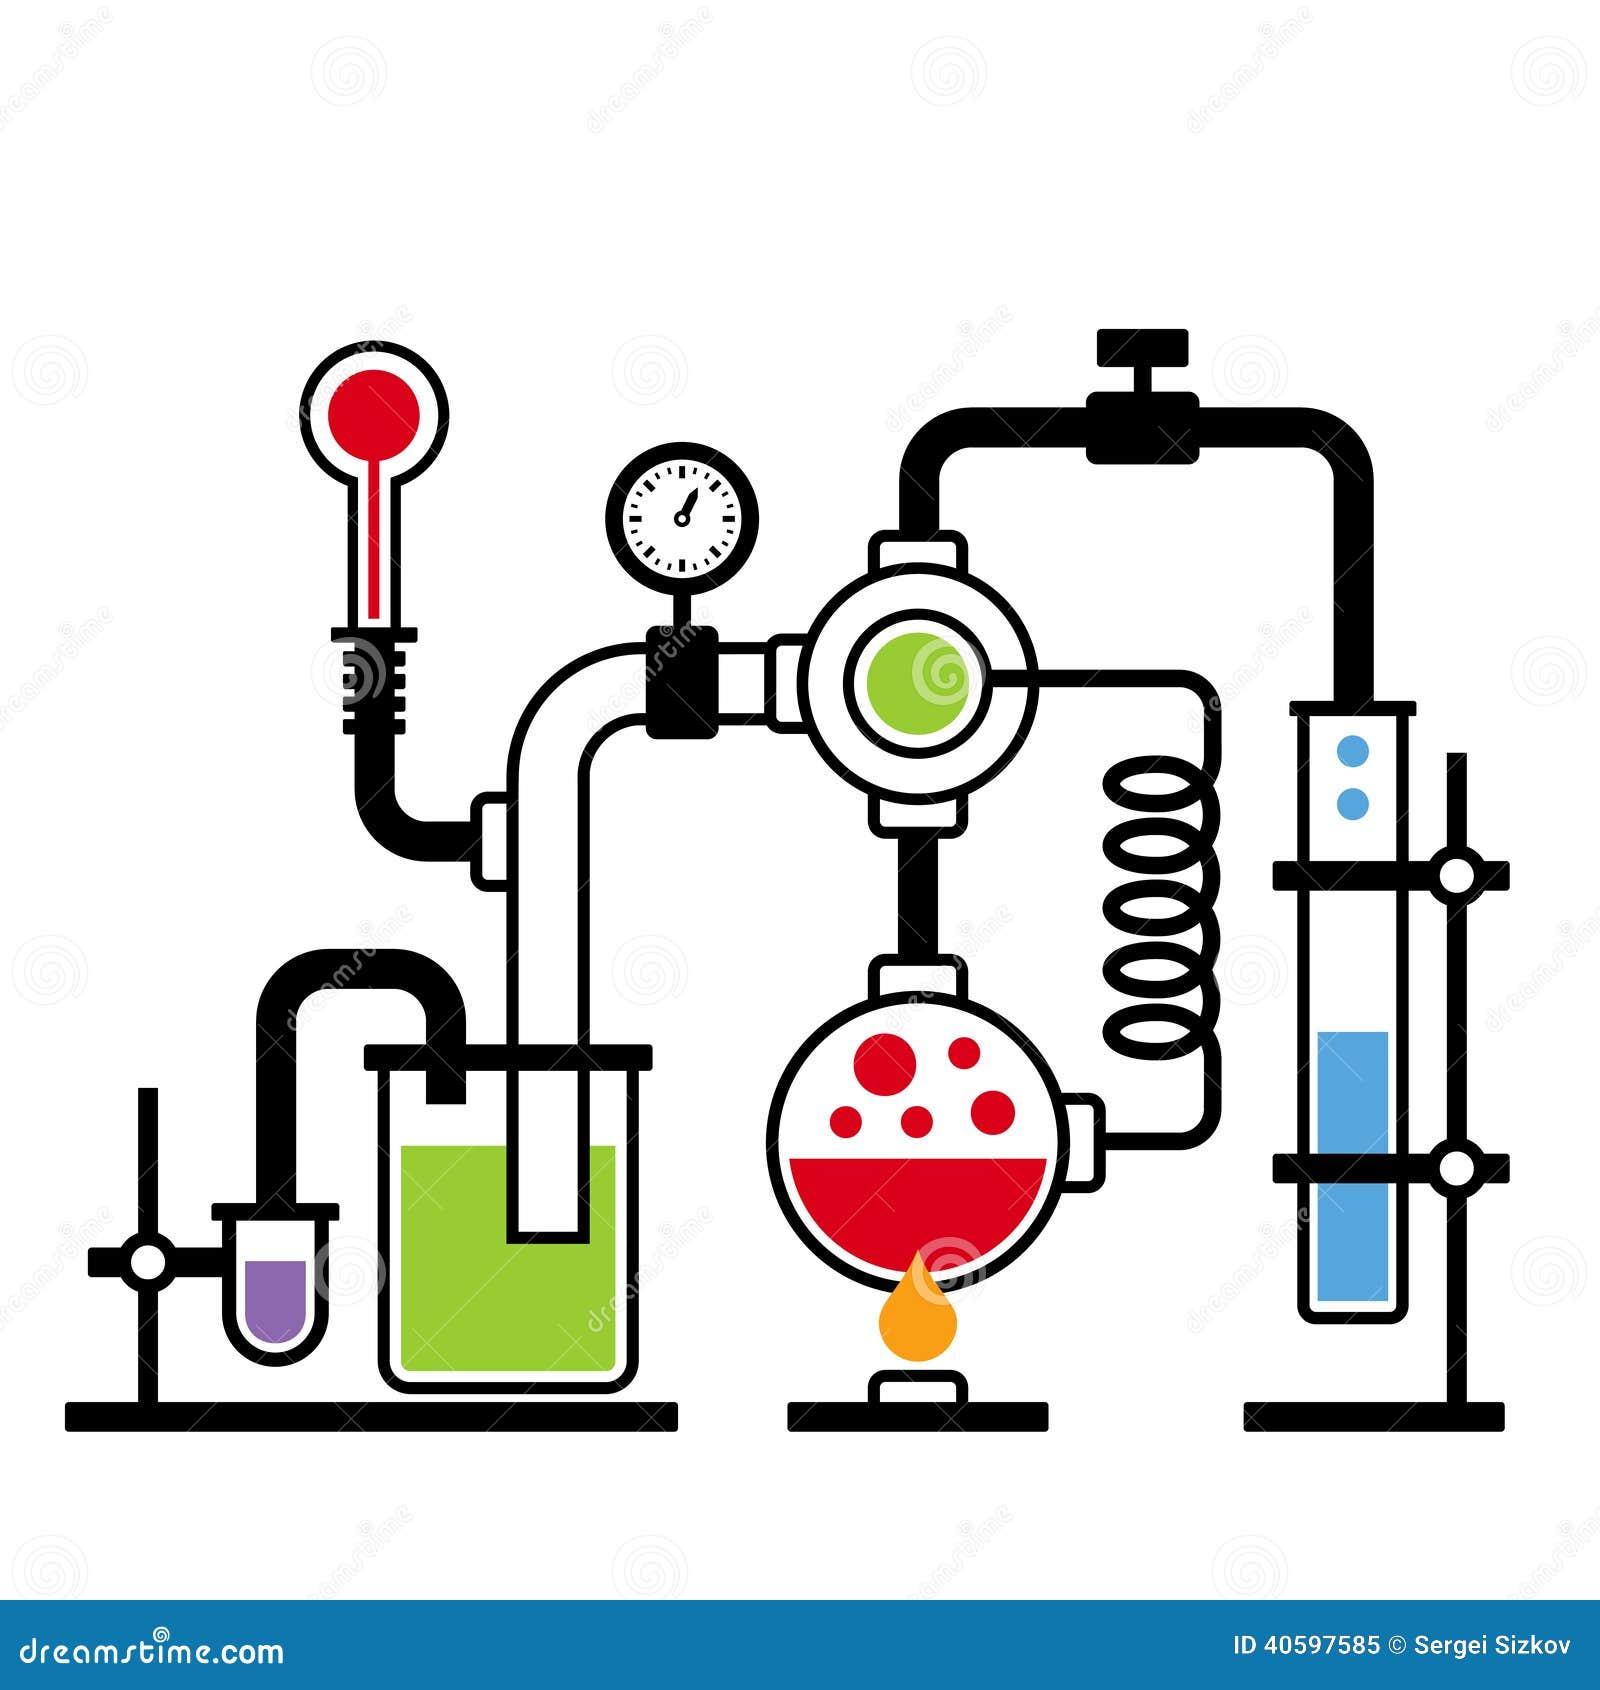 Chemistry Laboratory Infographic Set 2 Stock Vector - Image: 40597585